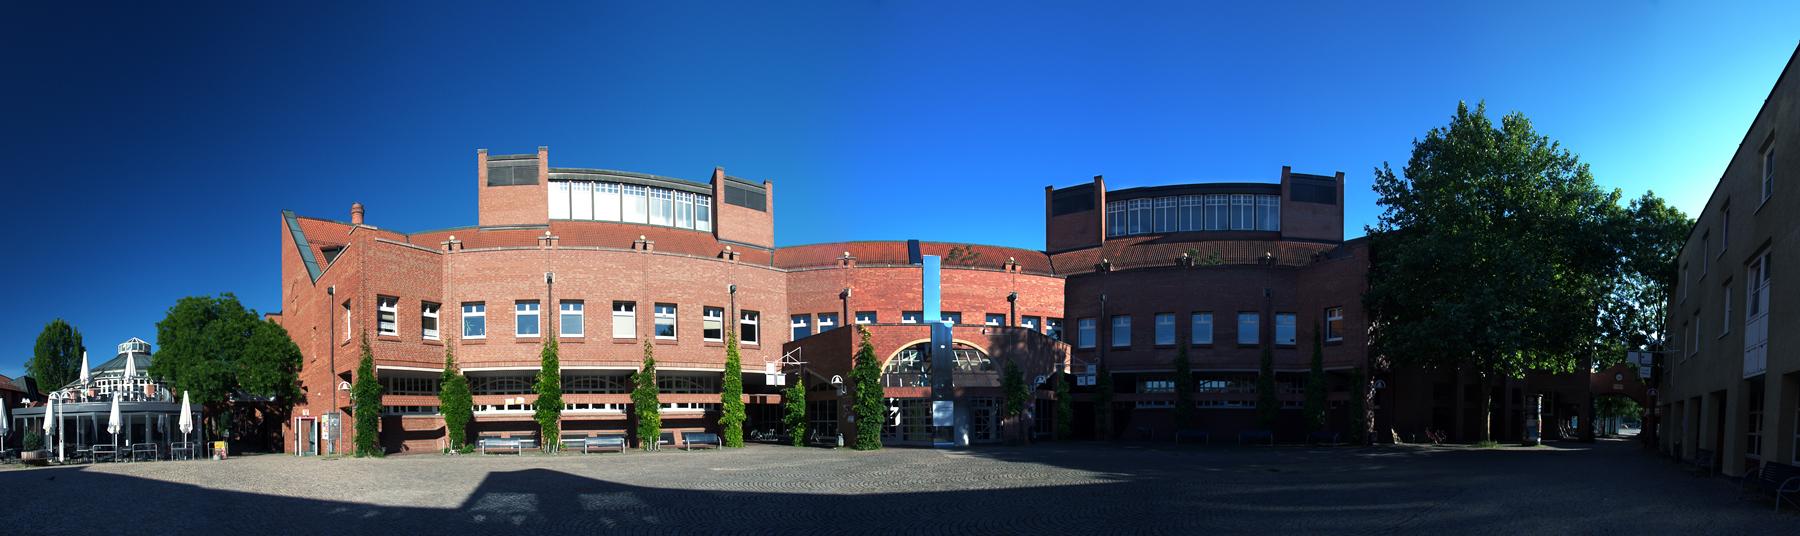 Universiät Kassel Lafferte